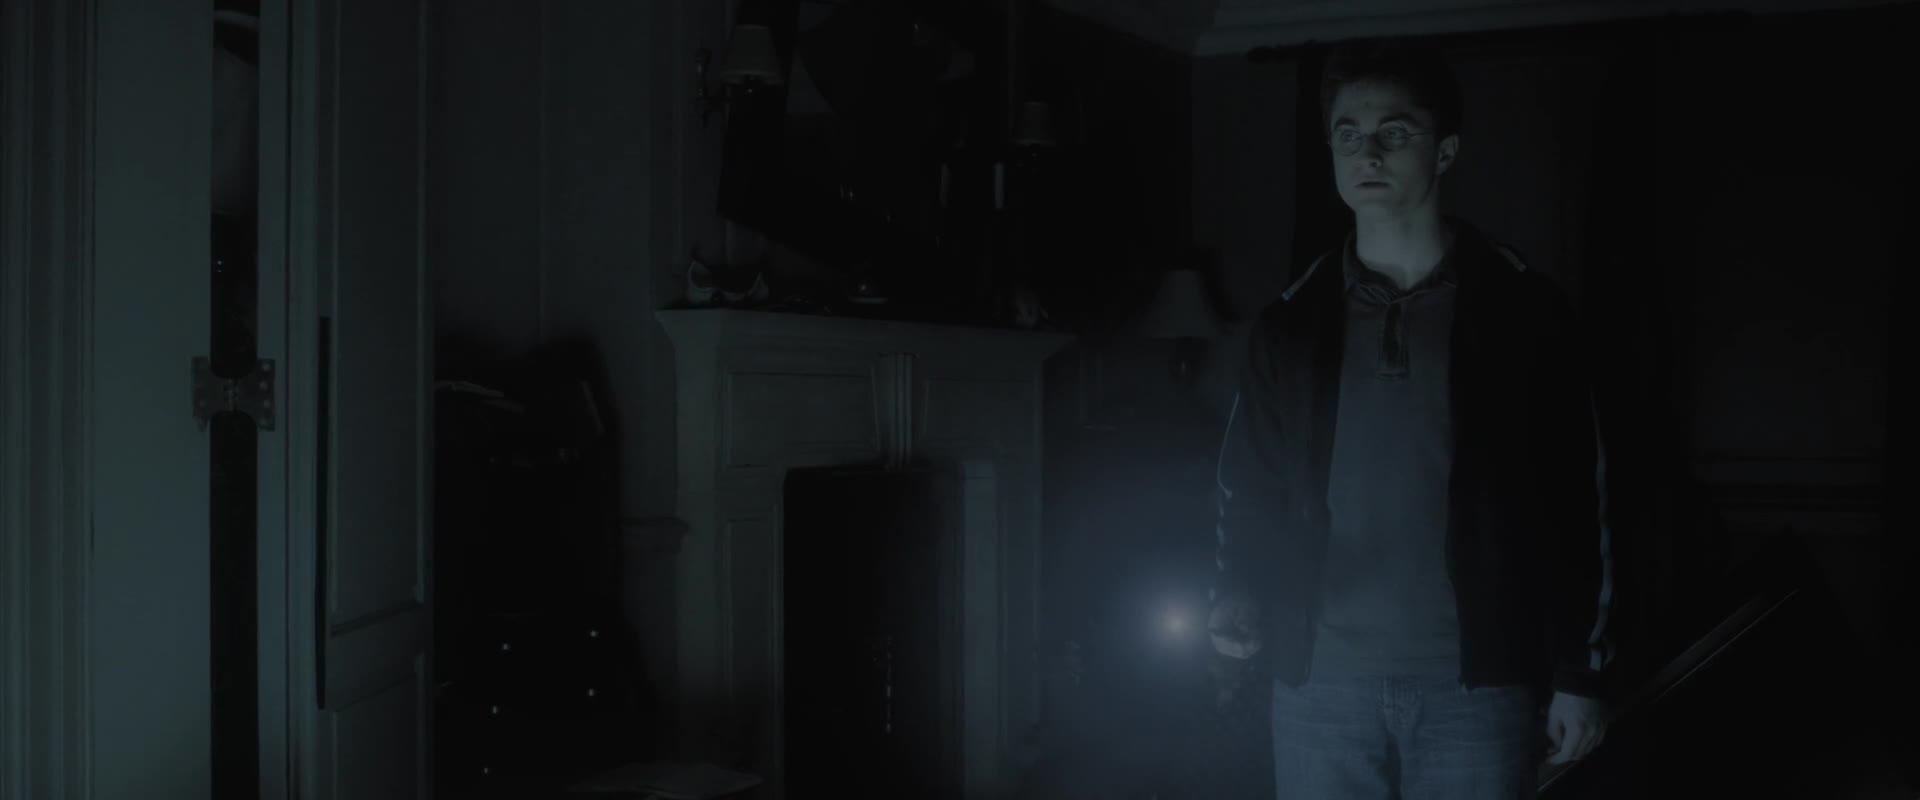 Harry Potter 6 A Princ Dvoji Krve  2009  1080p CZ dabing